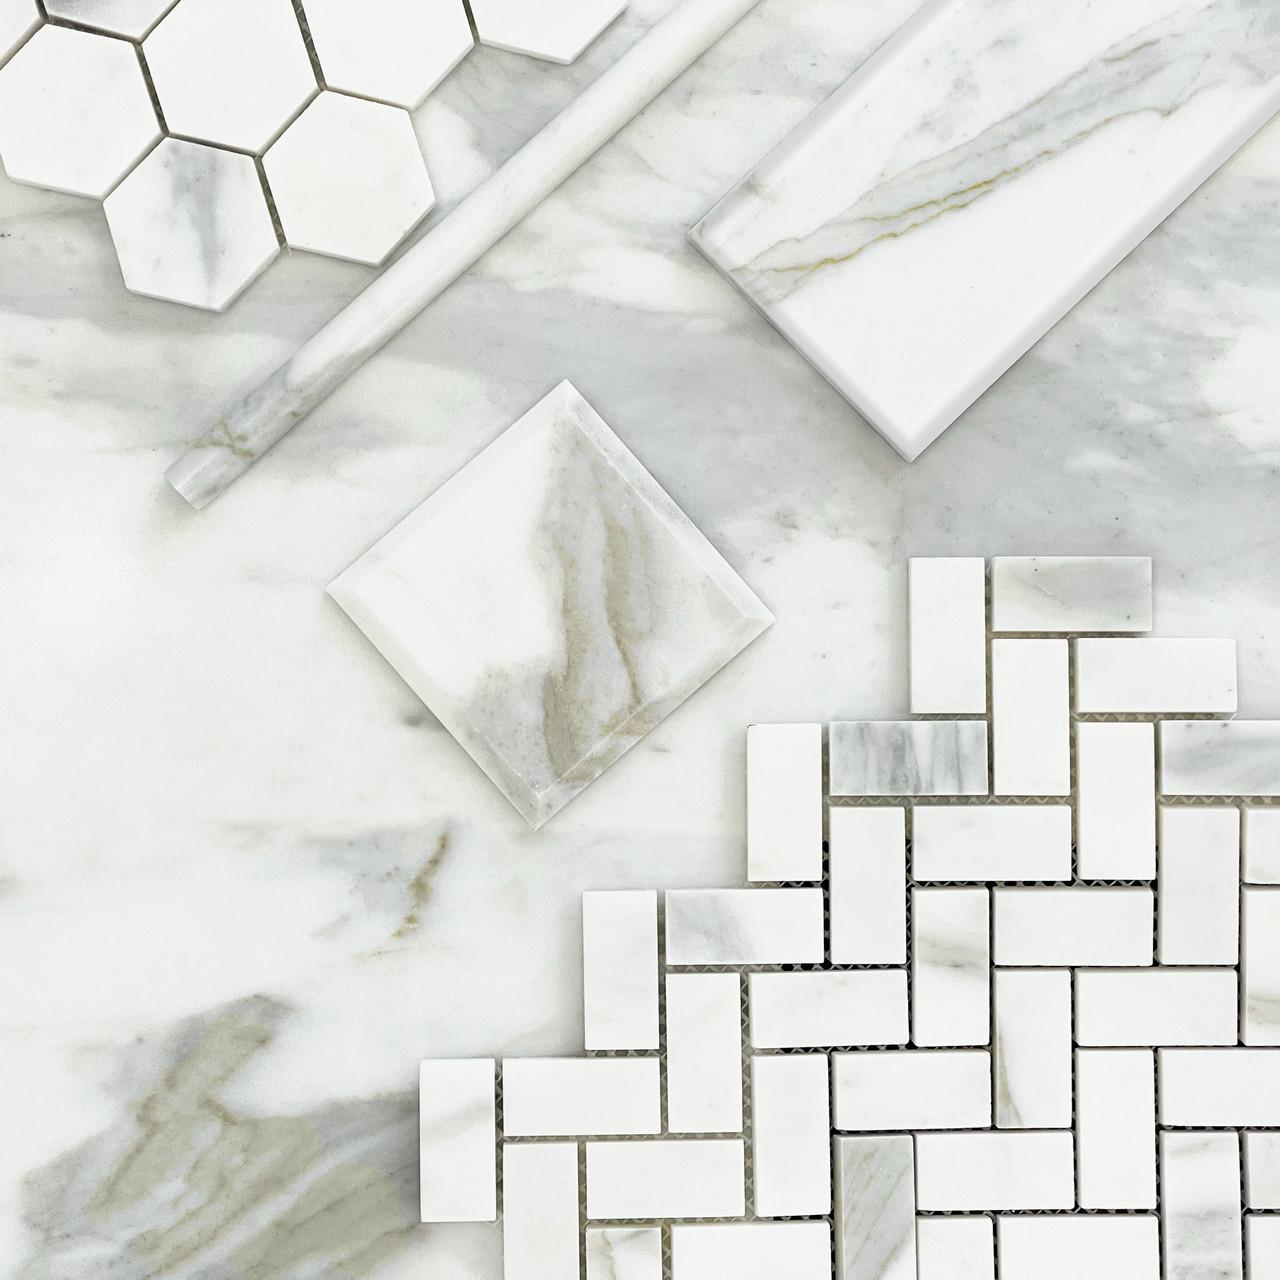 6x12 calacatta gold italian marble wide bevel subway tile honed